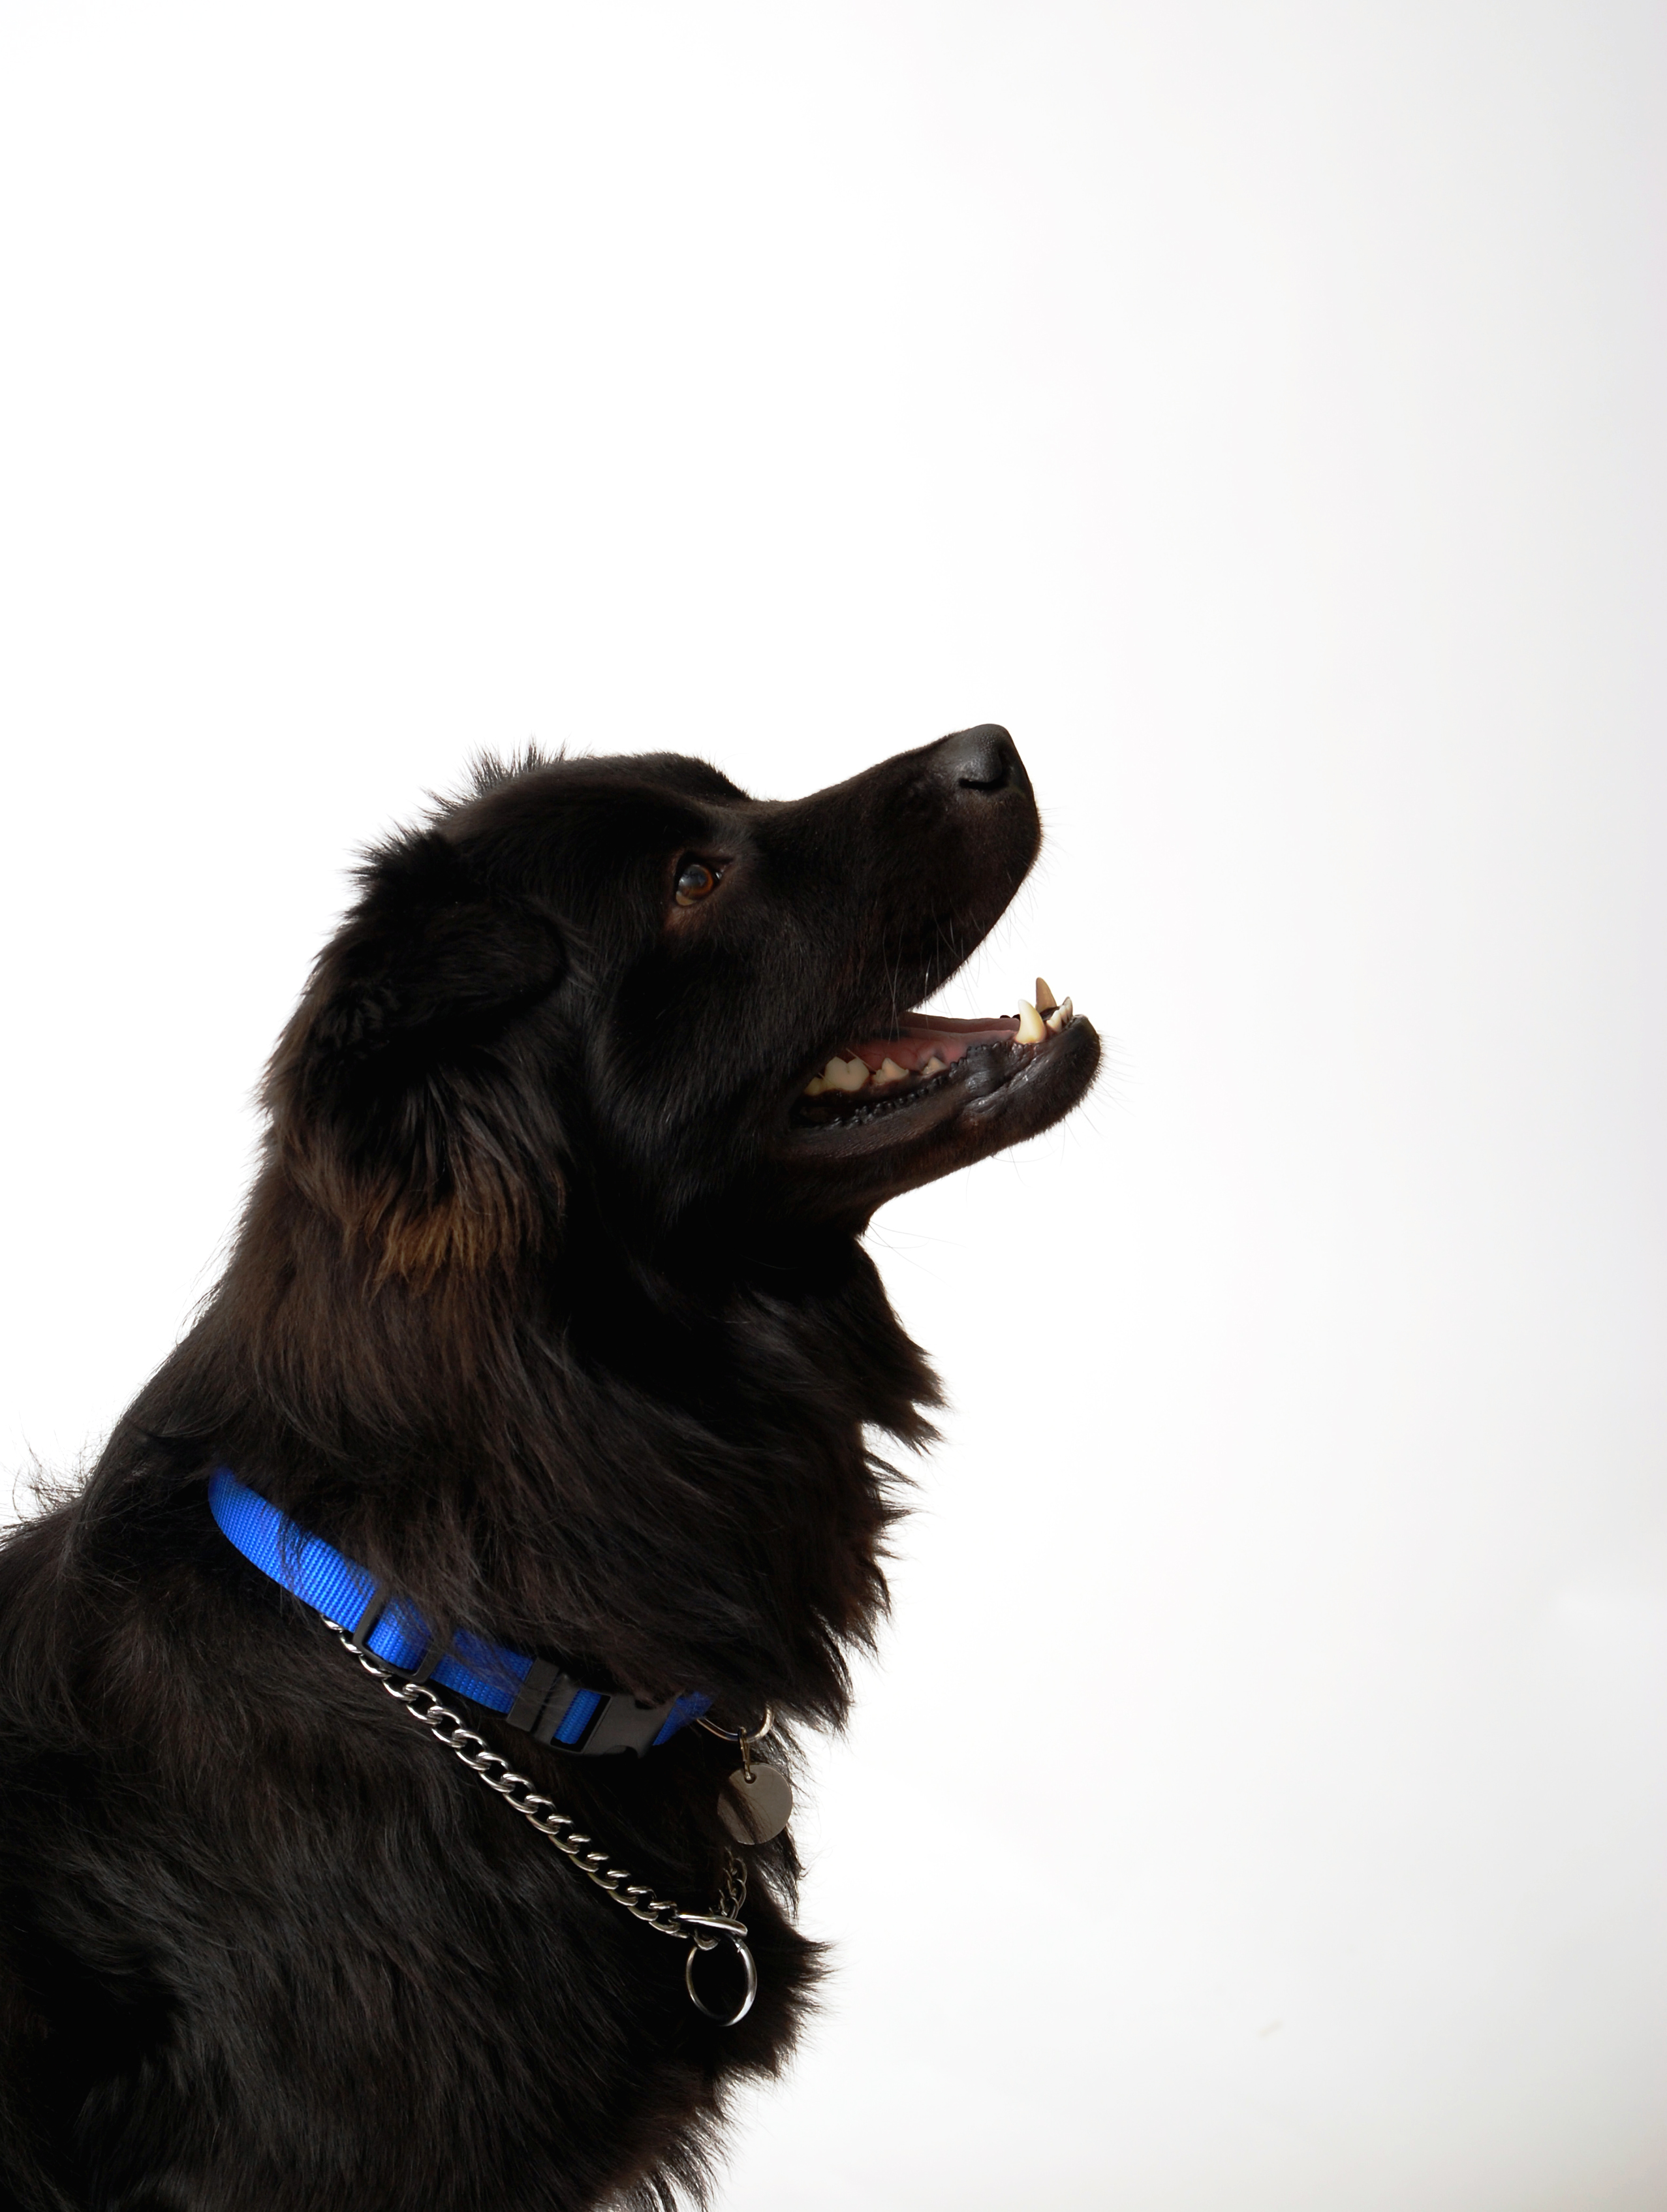 Black dog, Animal, Black, Dog, Free dog photos, HQ Photo